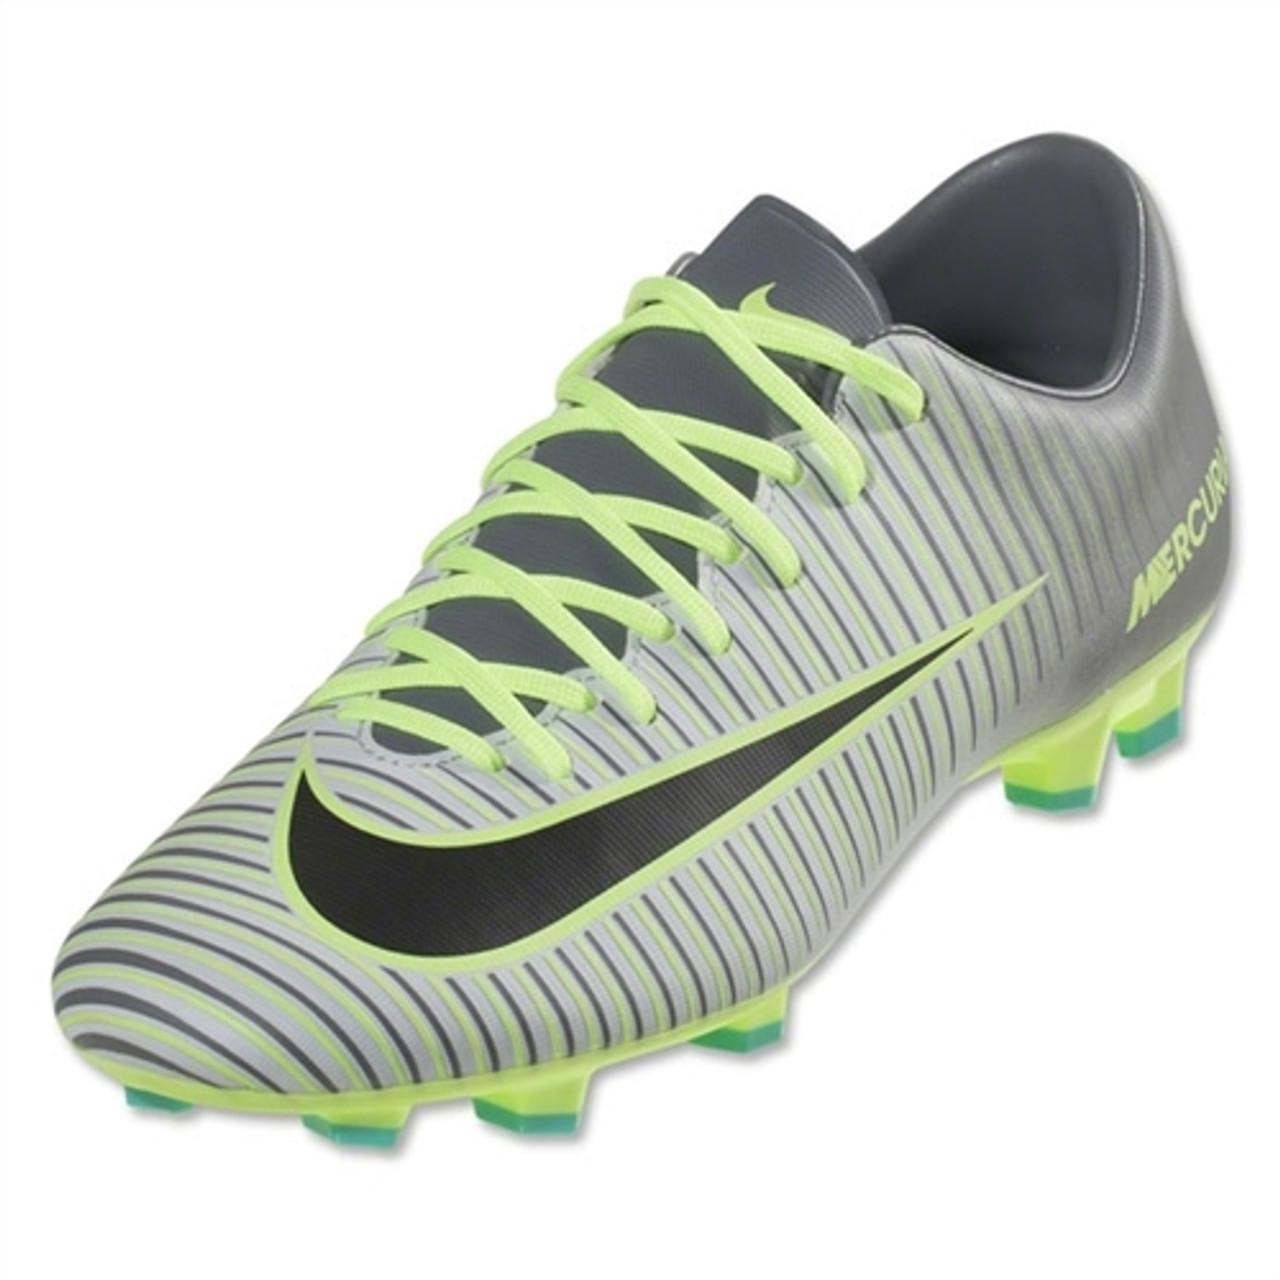 c724f9c56219 Nike Mercurial Victory VI FG - Pure Platinum/Black/Ghost Green (123016) -  ohp soccer